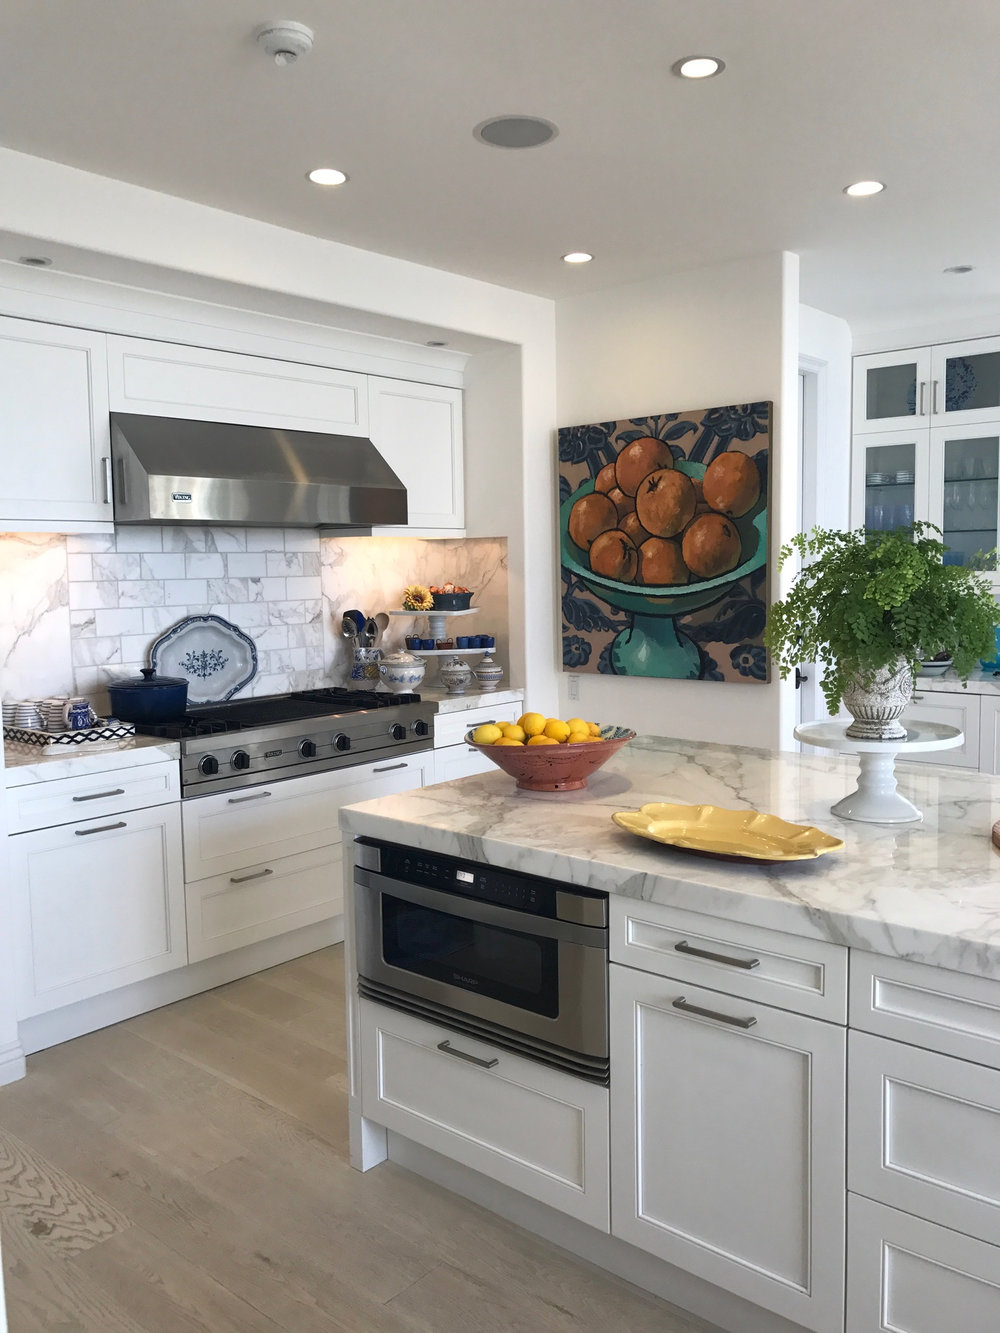 Laguna Beach all white kitchen with wood floors and art.